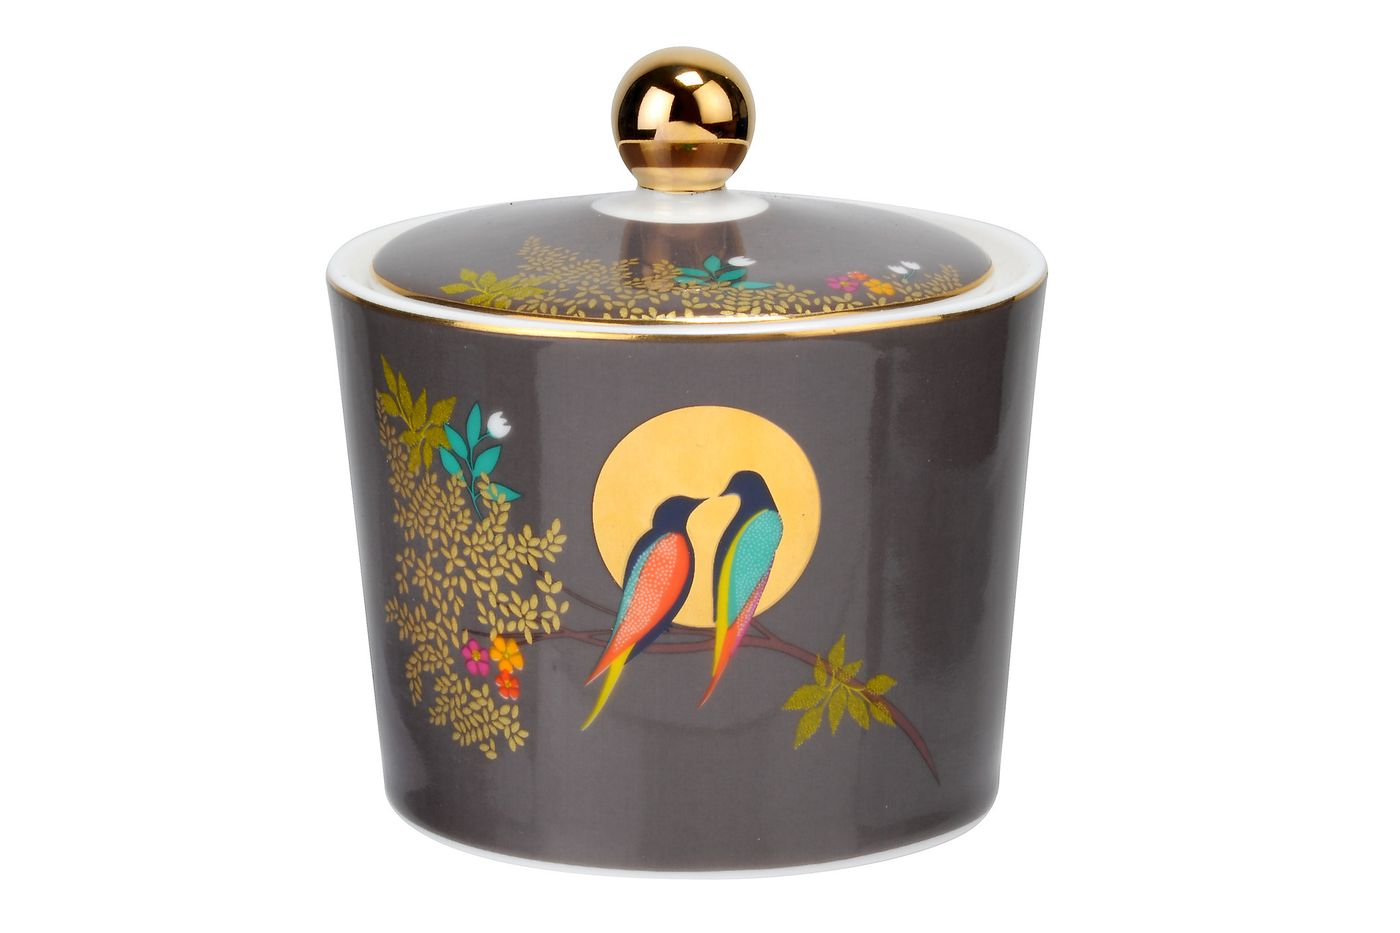 Sara Miller London for Portmeirion Chelsea Collection Sugar Bowl - Lidded (Tea) thumb 1